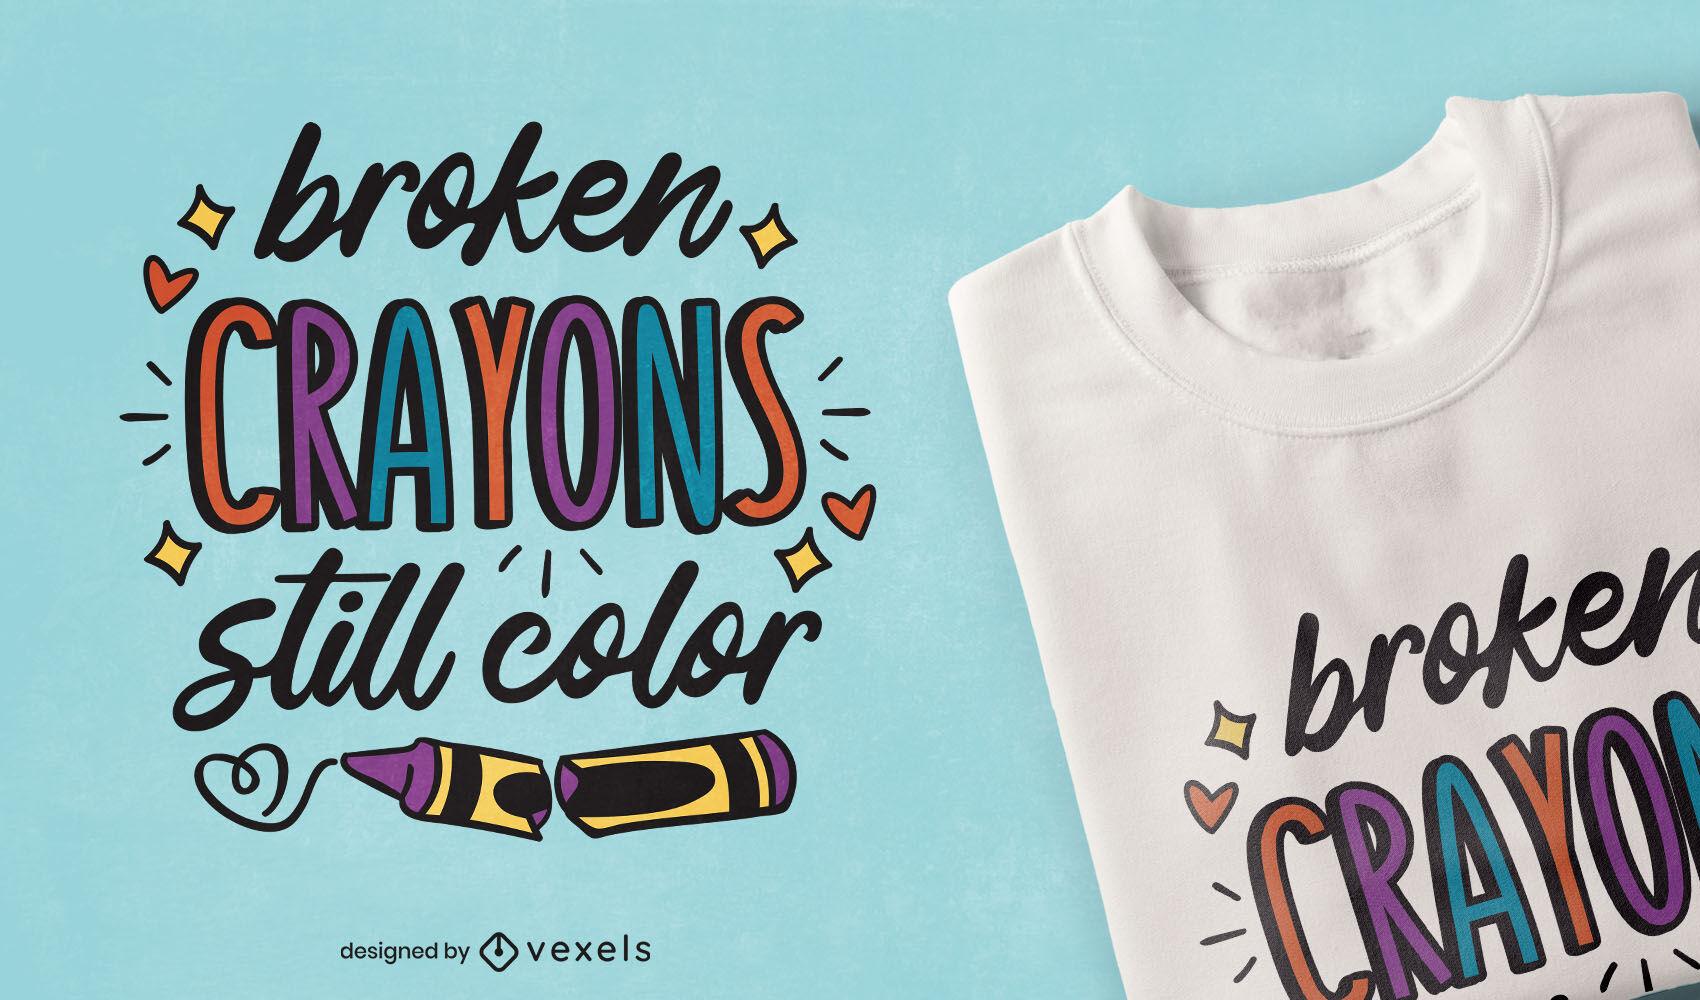 Broken crayons color t-shirt design